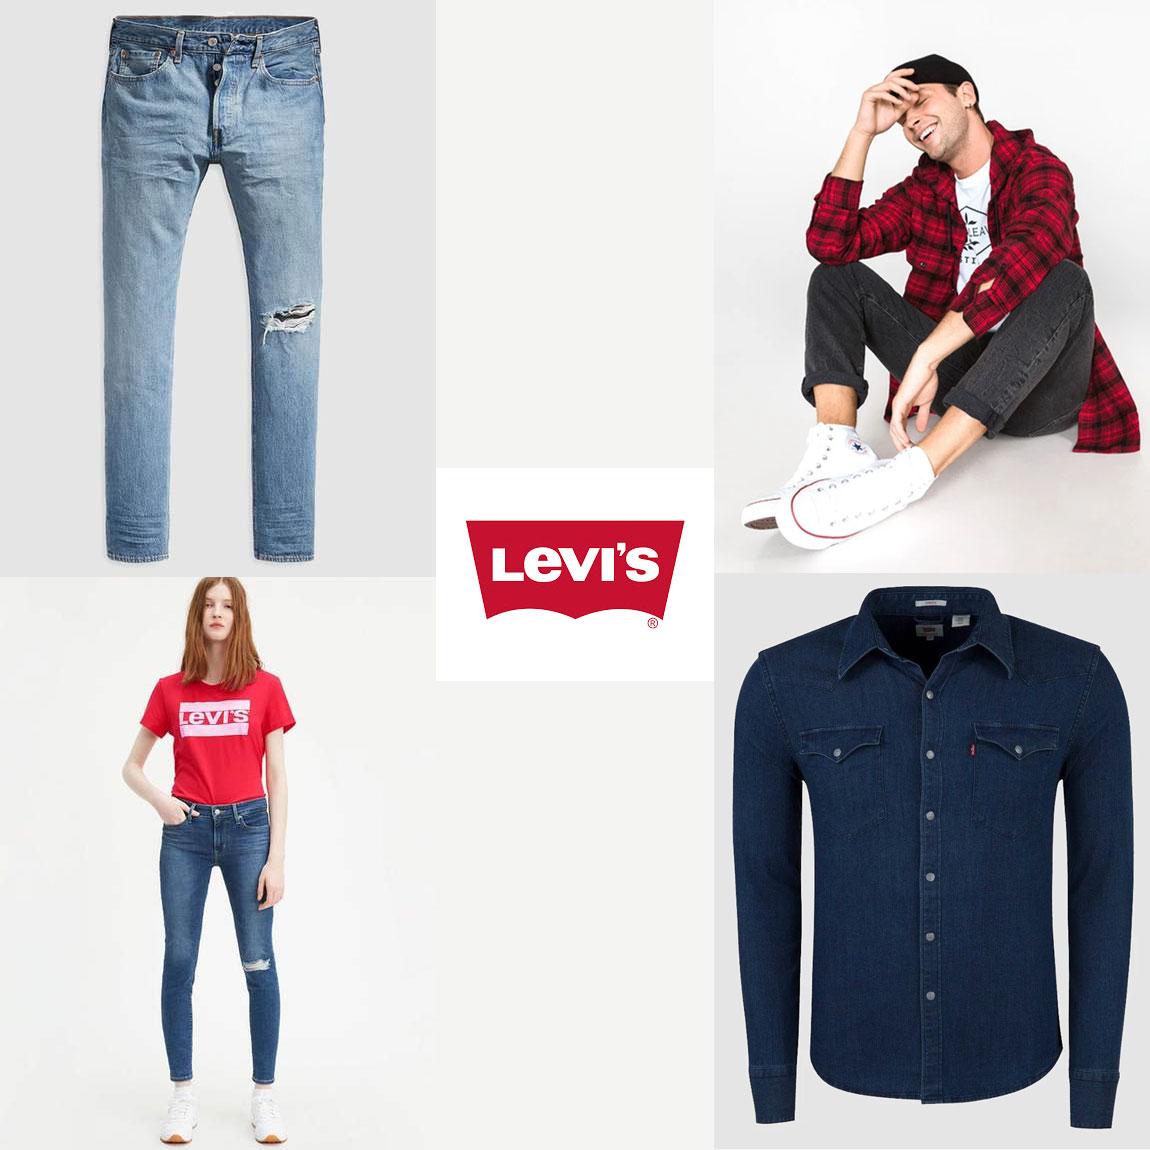 Levi's: ALLES 70% korting